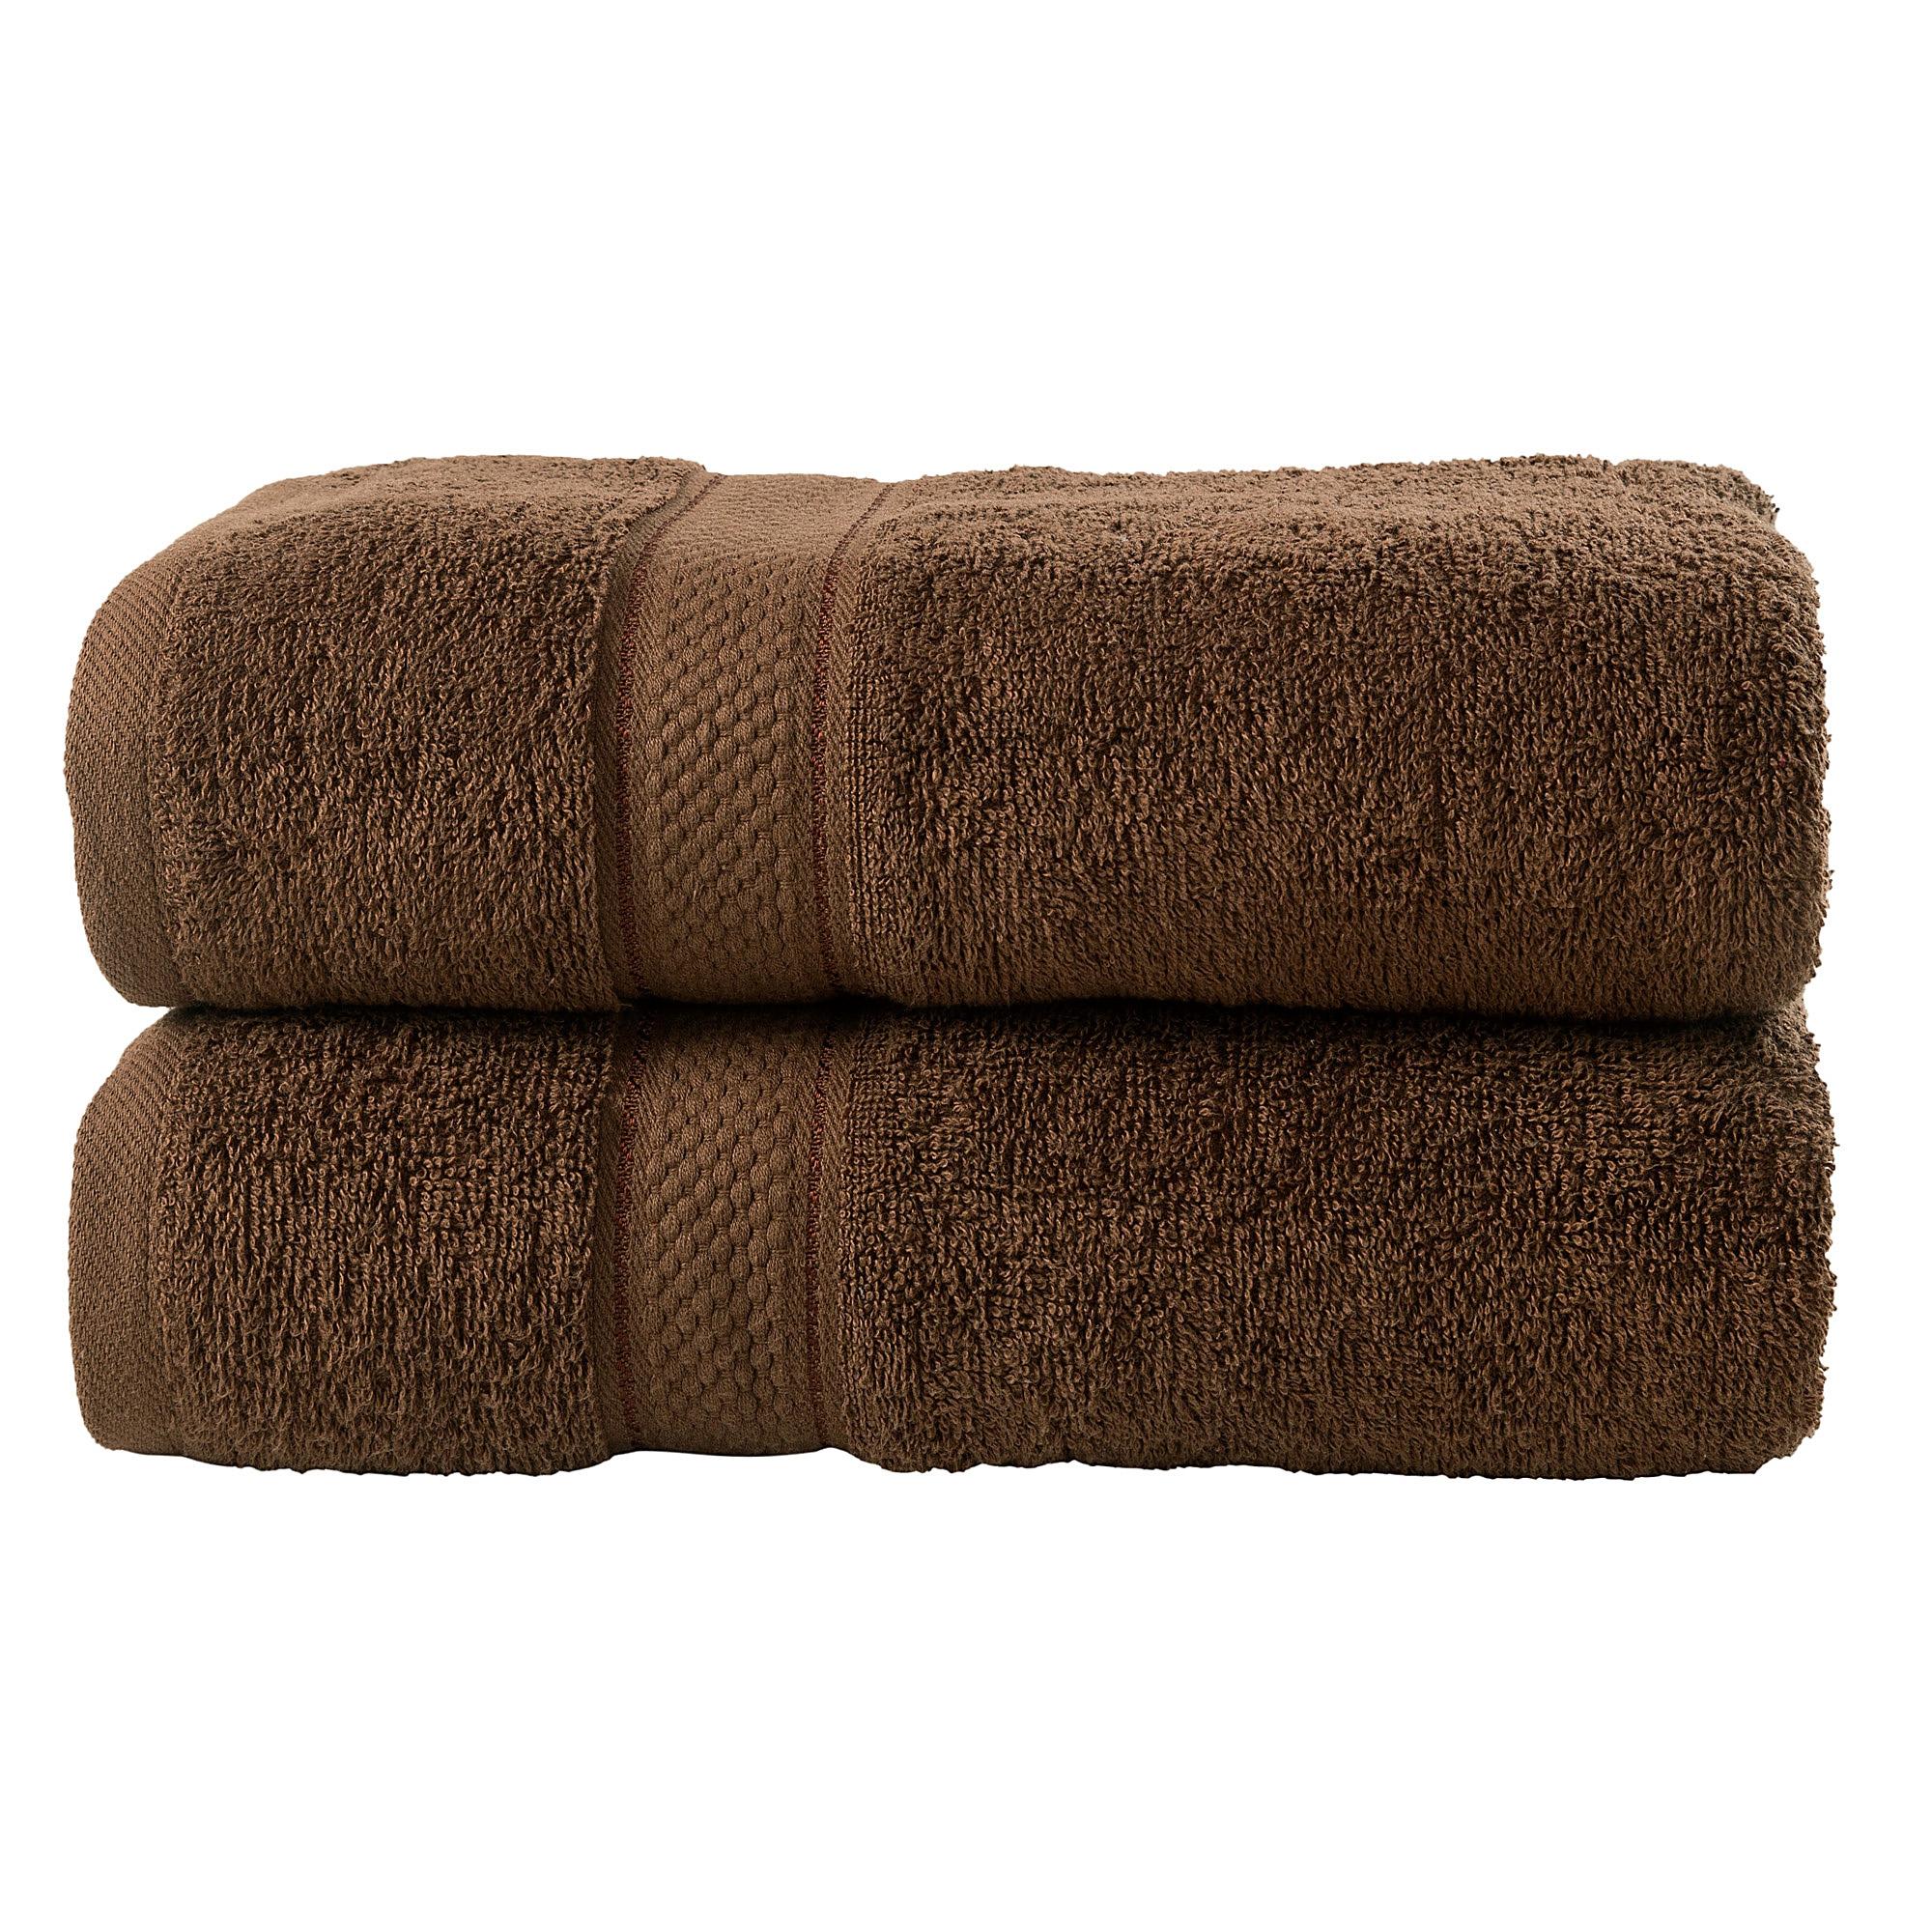 Bale Set 2pcs Chocolate Plain Extra Large Bath Sheet Towel